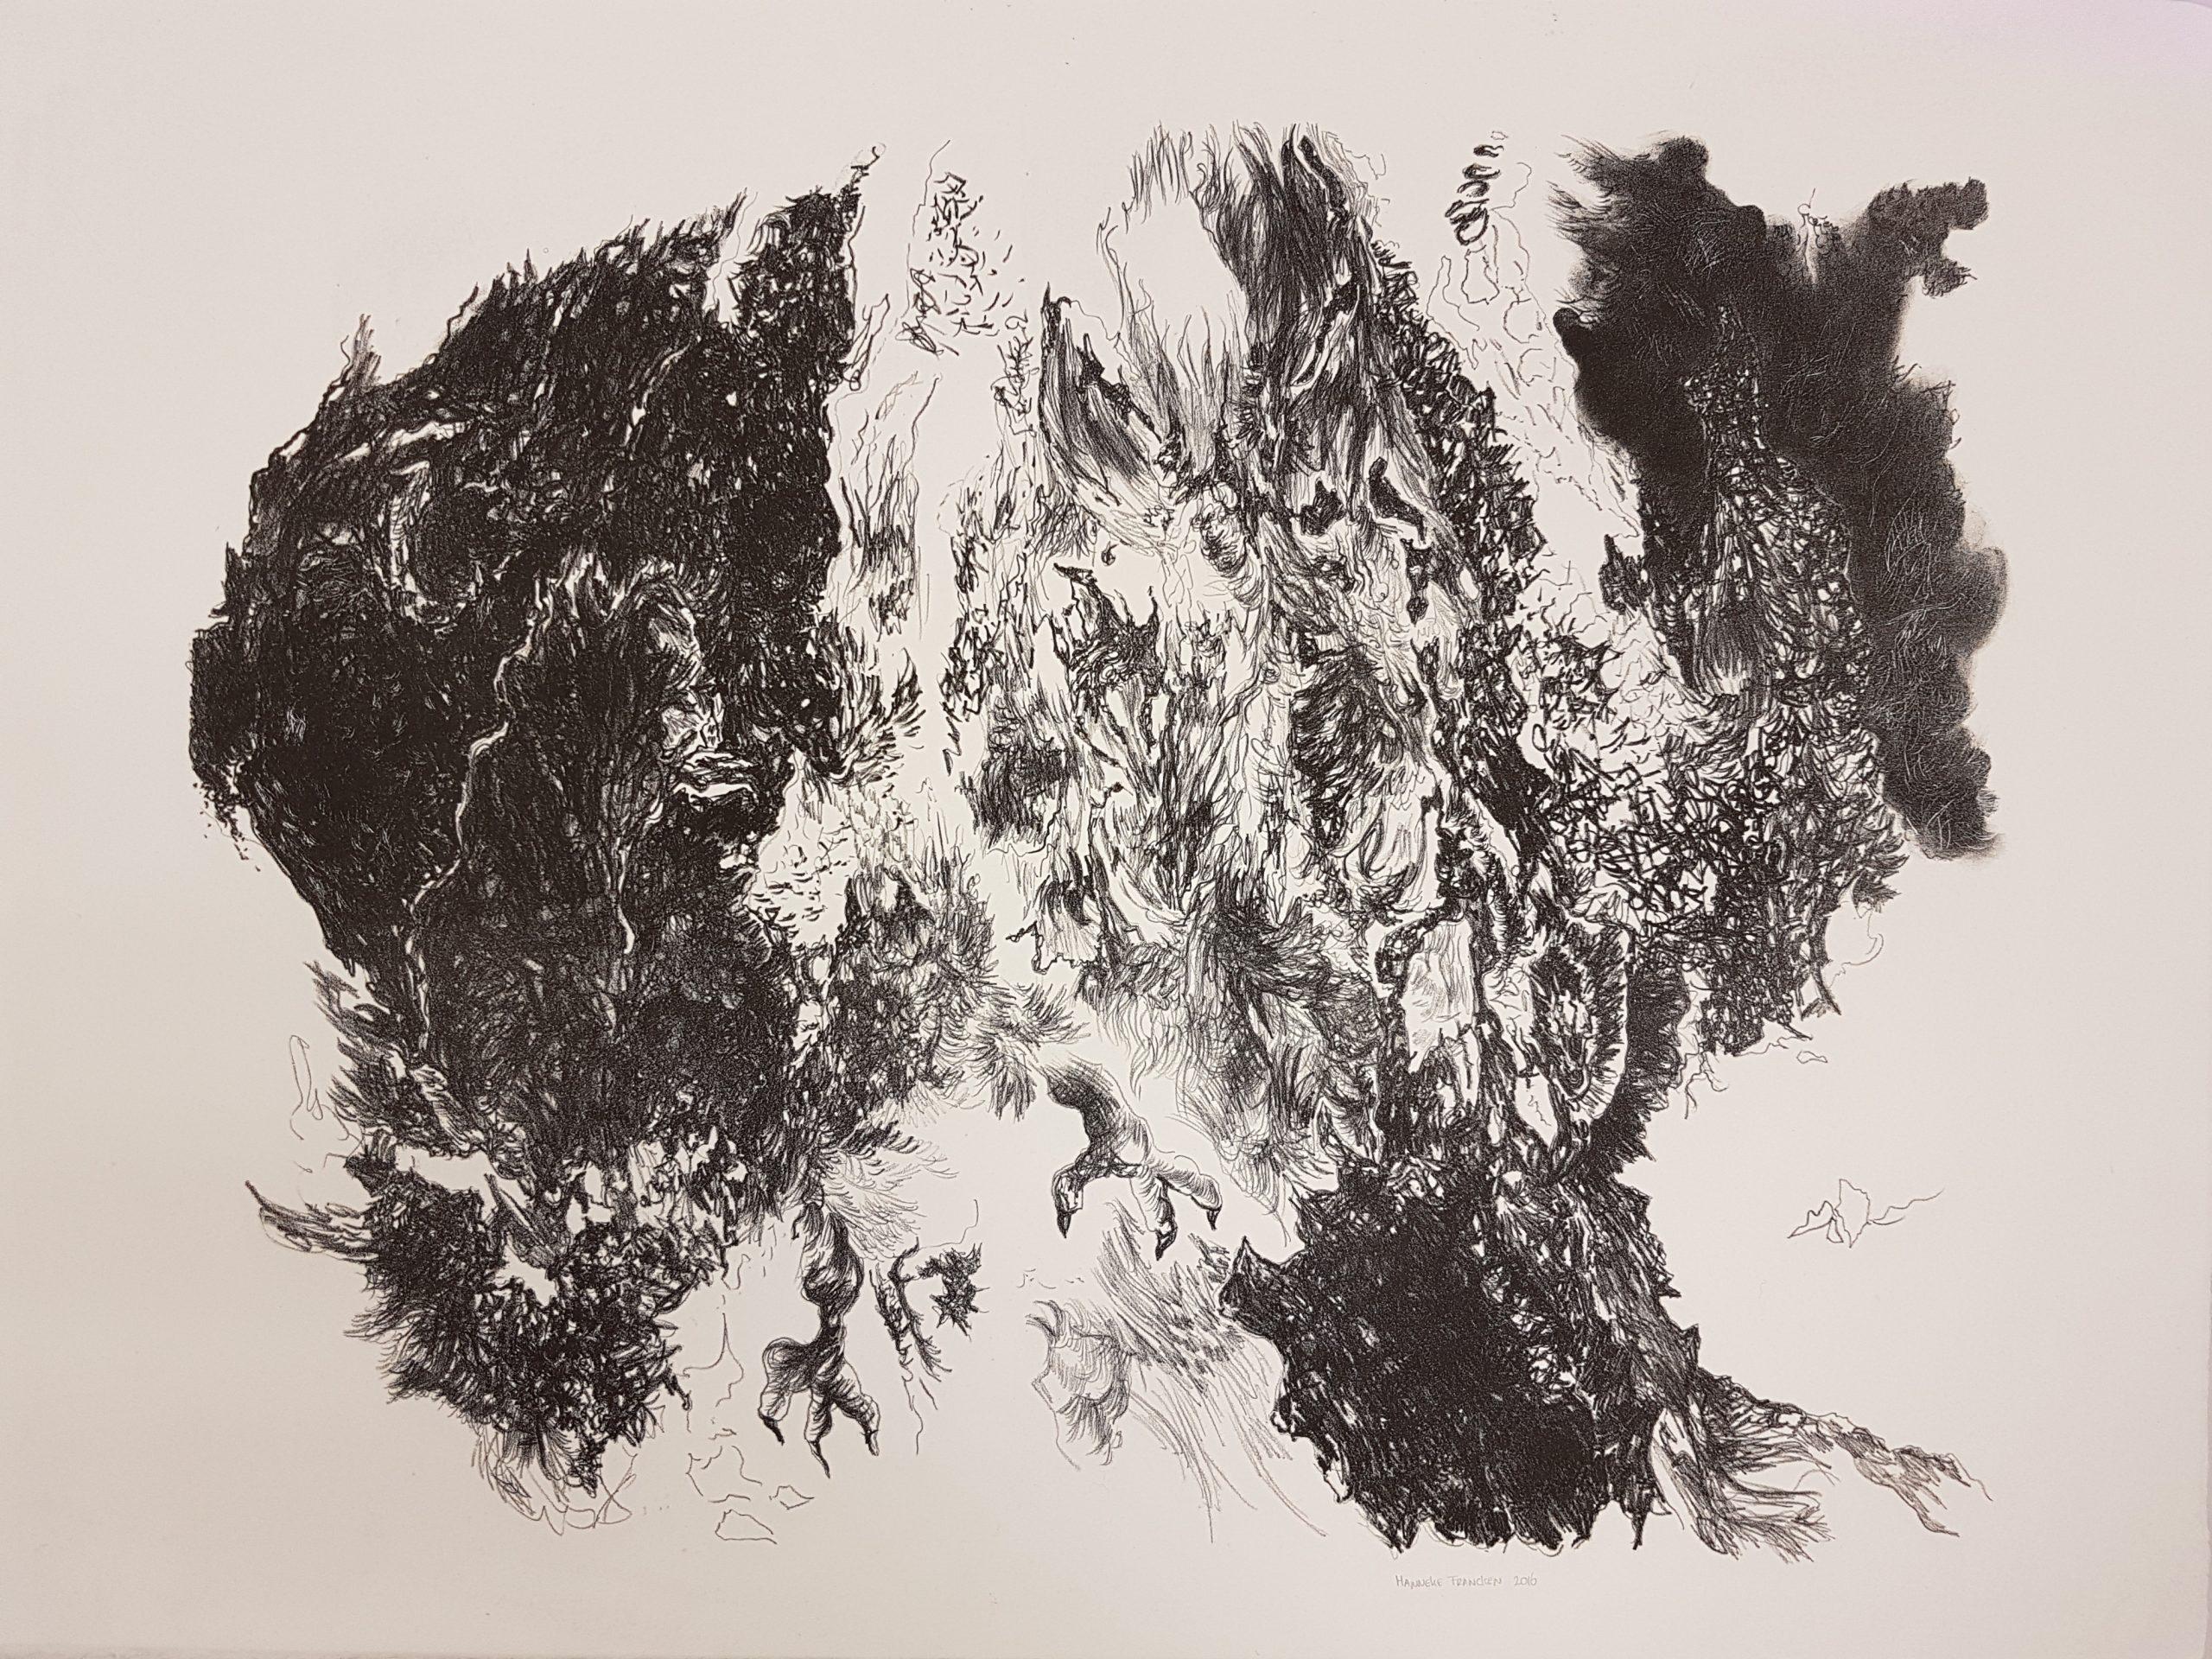 Intertwine, 2016, litho, 57x 76 cm